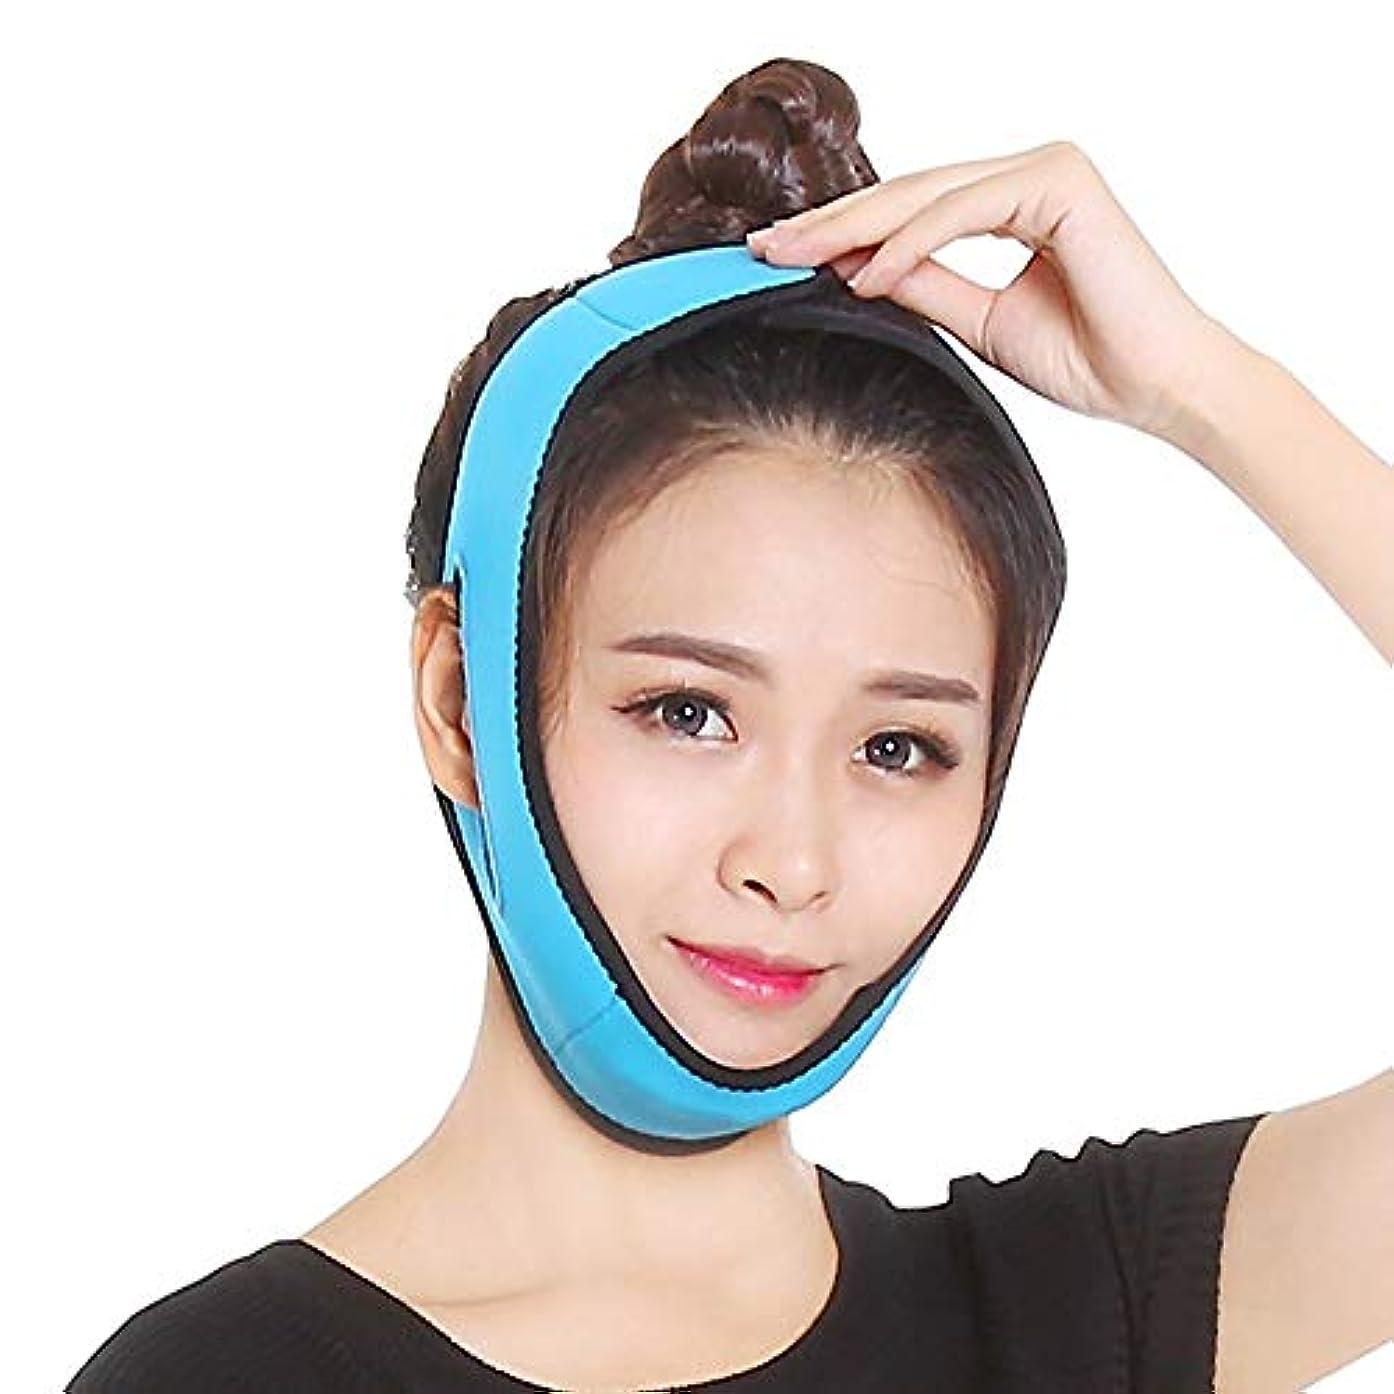 BS フェイシャルリフティングスリミングベルト - 薄いフェイス包帯二重あごデバイス無料フェイシャルマッサージ整形マスクを引き締める顔と首の顔スリム フェイスリフティングアーティファクト